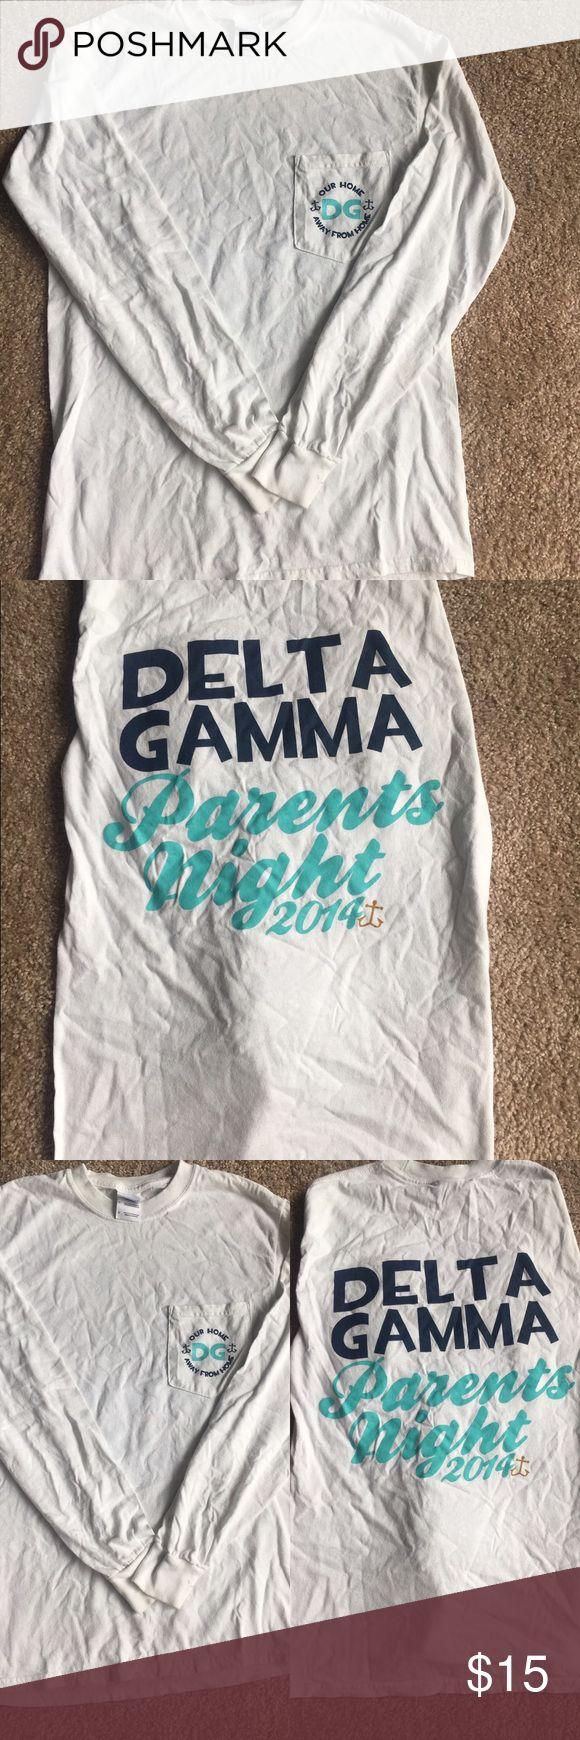 Delta Gamma (DG) parents weekend long sleeve shirt White long sleeve DG parents weekend shirt. Barely worn. Tops Tees - Long Sleeve